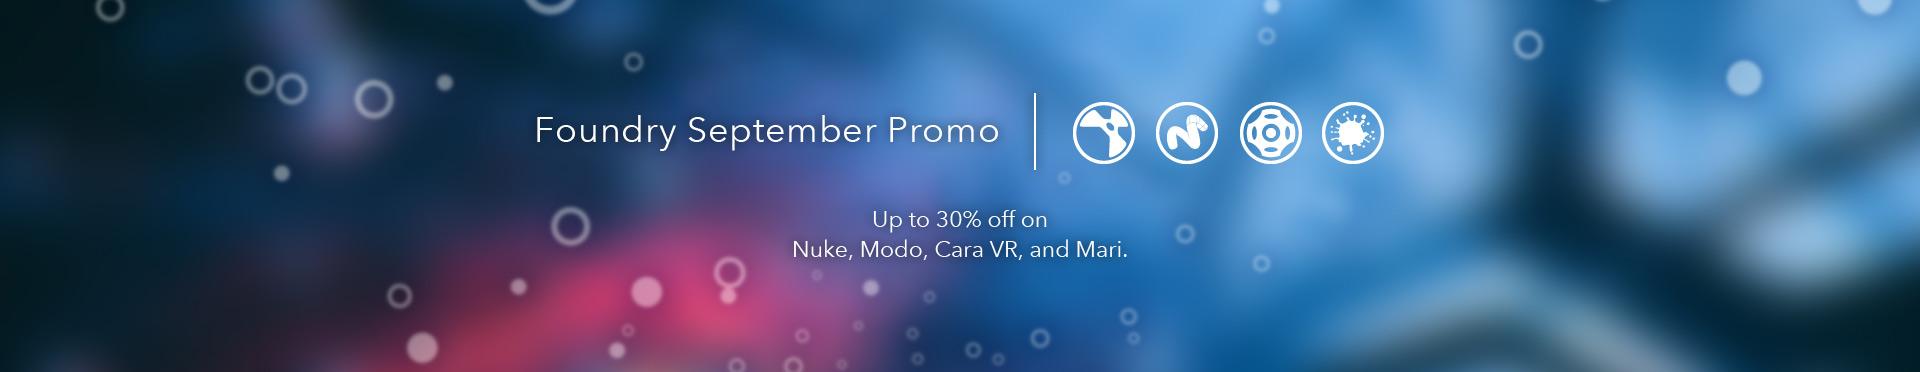 Foundry September Promo